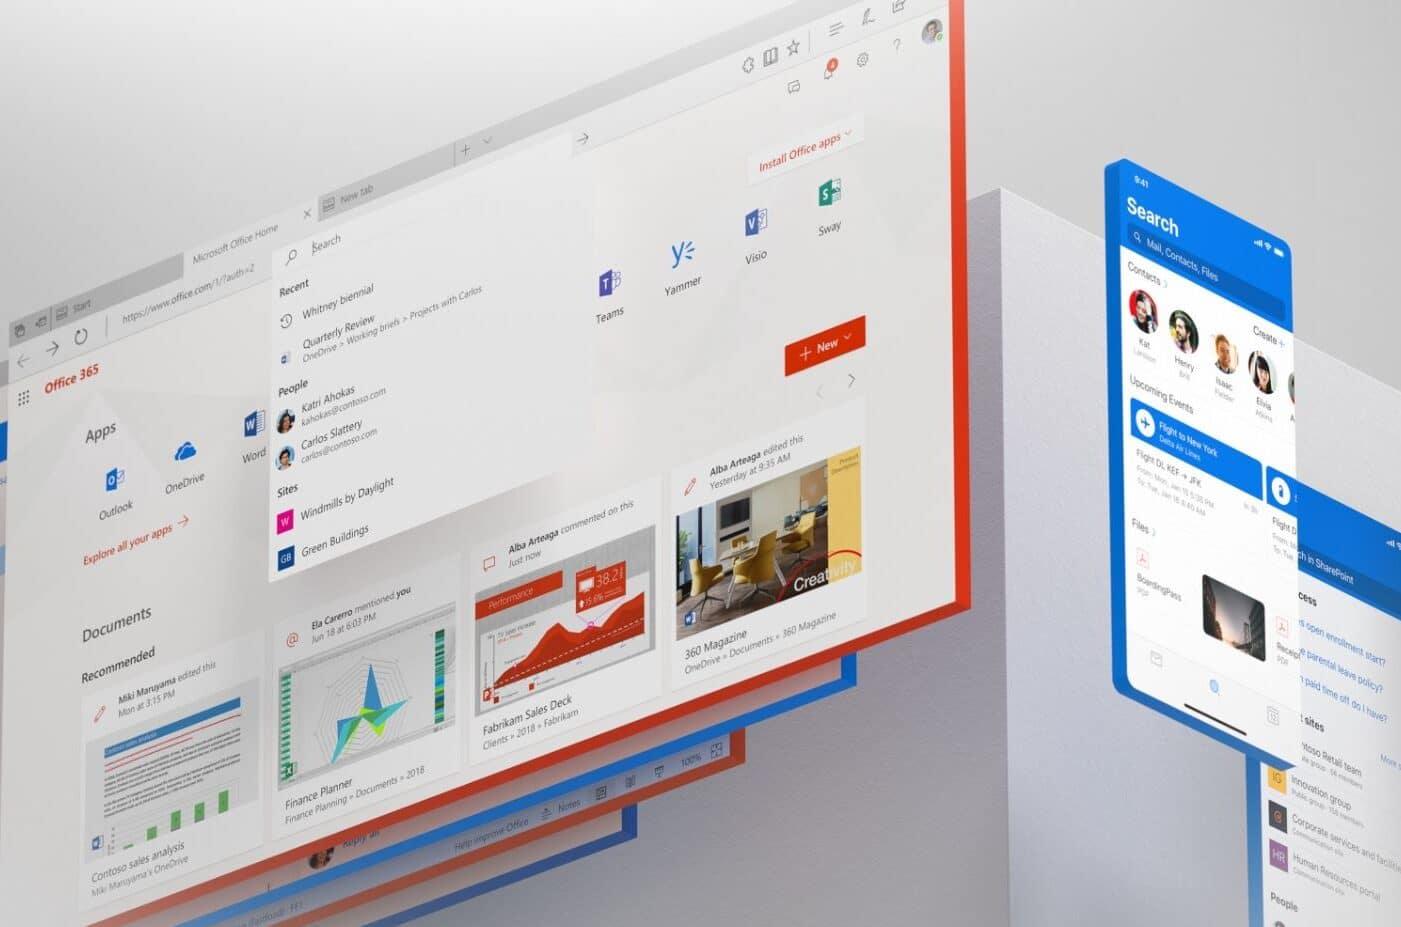 Windows 10 - Microsoft Corporation